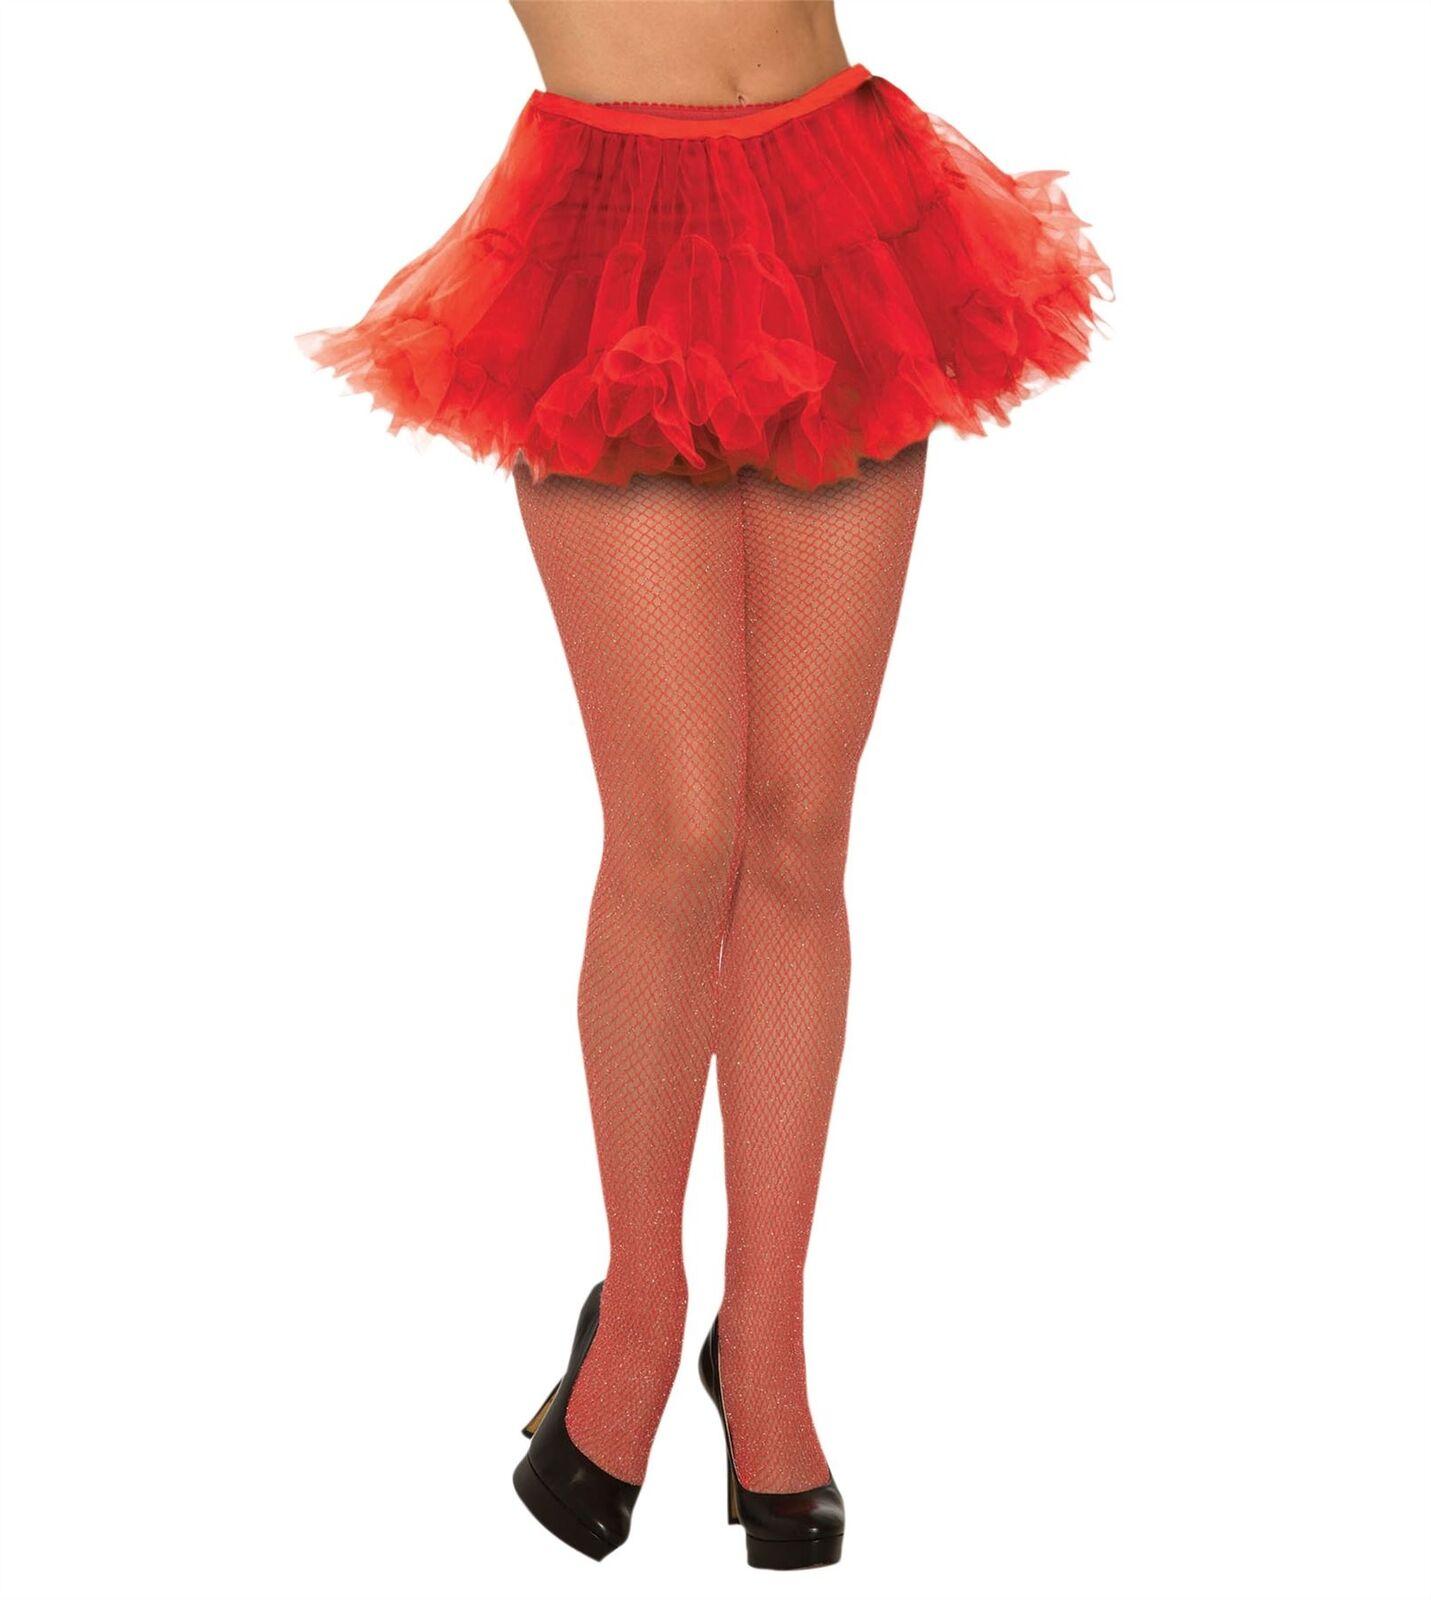 Fishnet Stockings Glitter Red, Fancy Dress